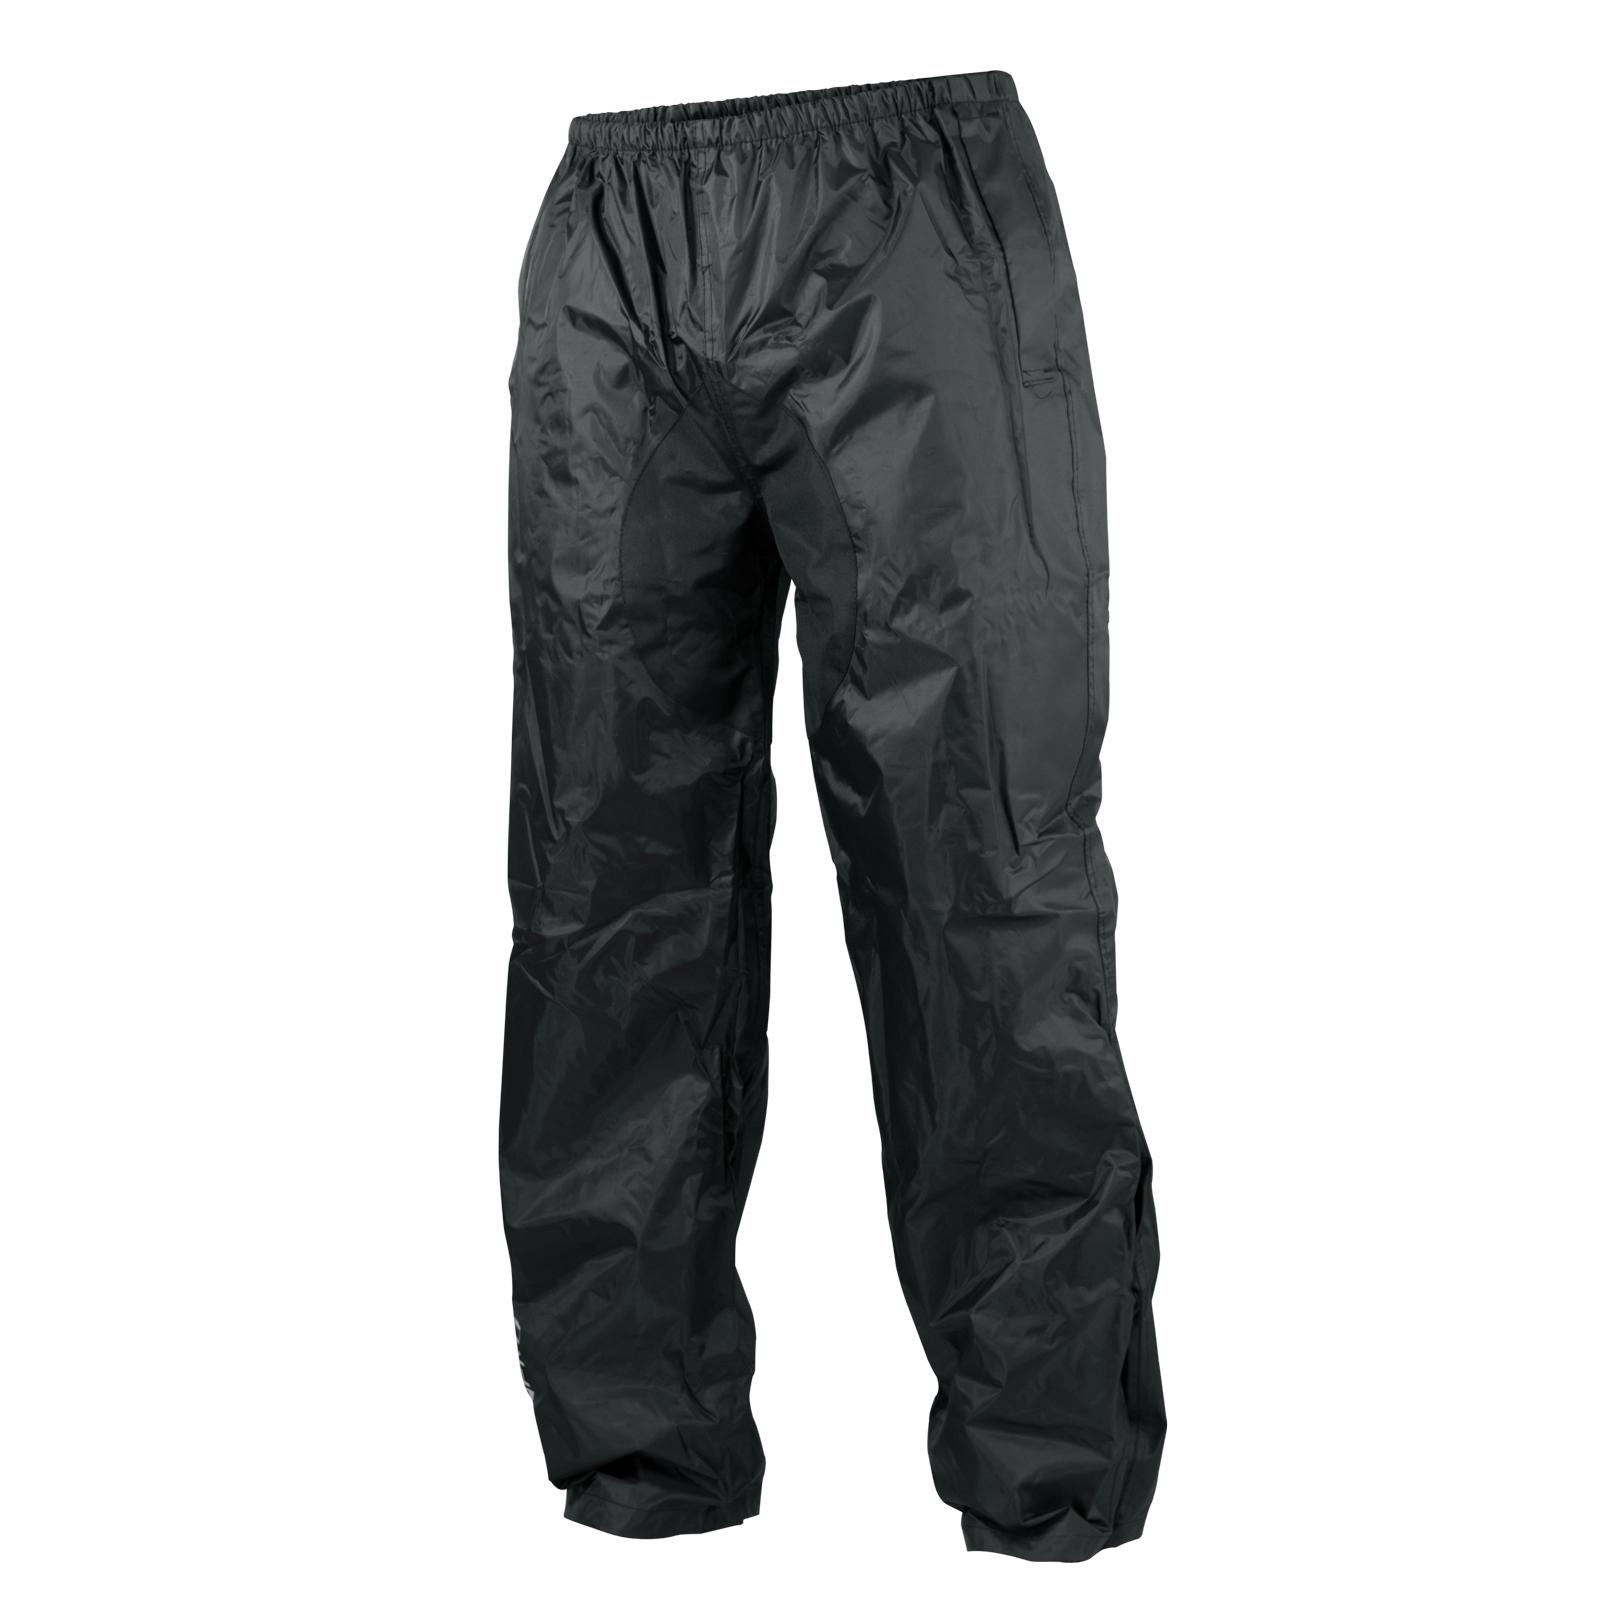 Pantalon-100-Impermeable-Motard-Moto-Unisex-Protection-Pluie-Unisexe miniature 6